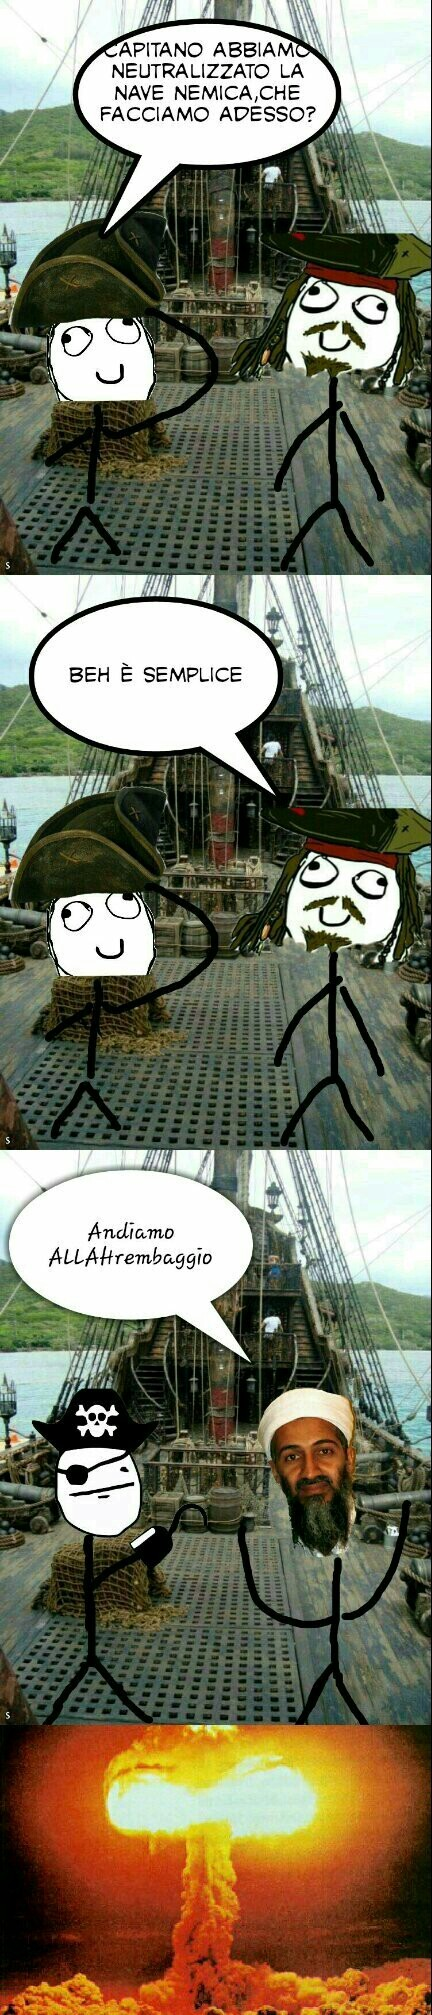 Swag nave - meme